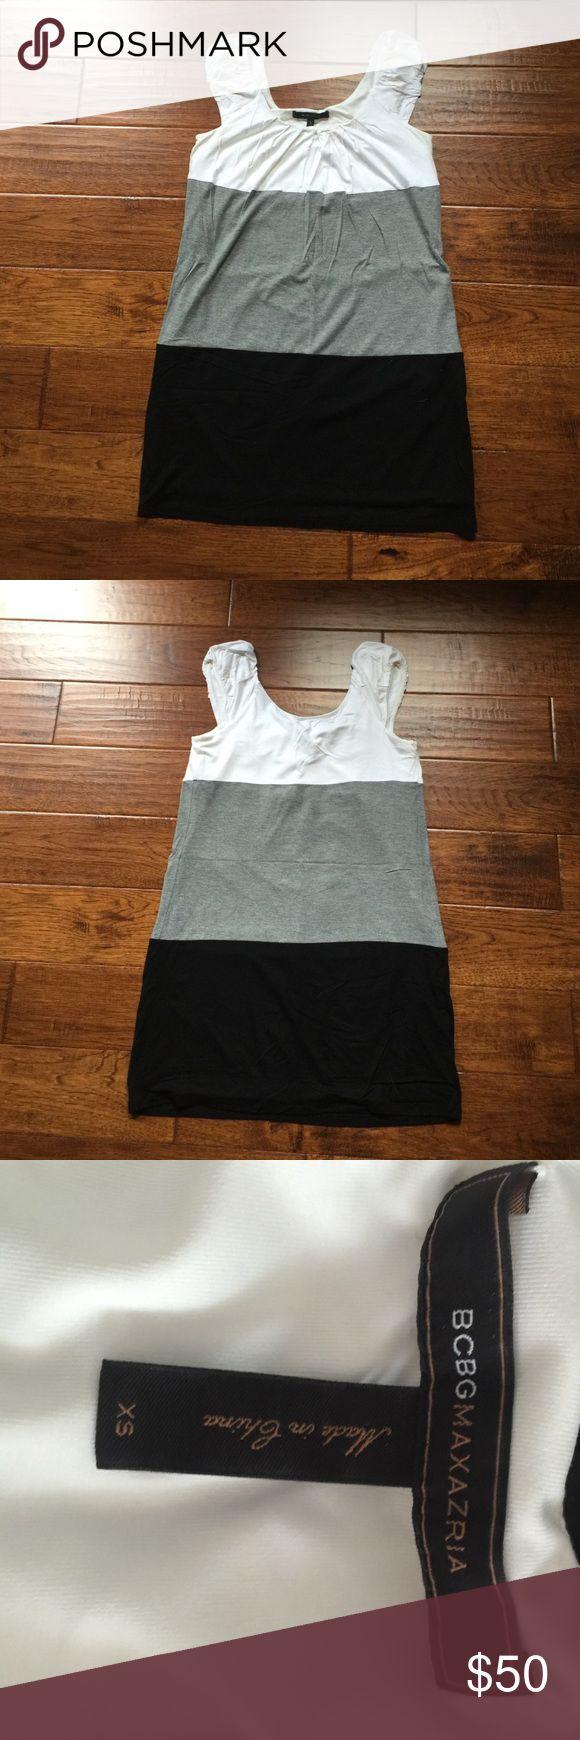 BCBG color block dress Great condition!  Super soft and flattering! BCBGMaxAzria Dresses